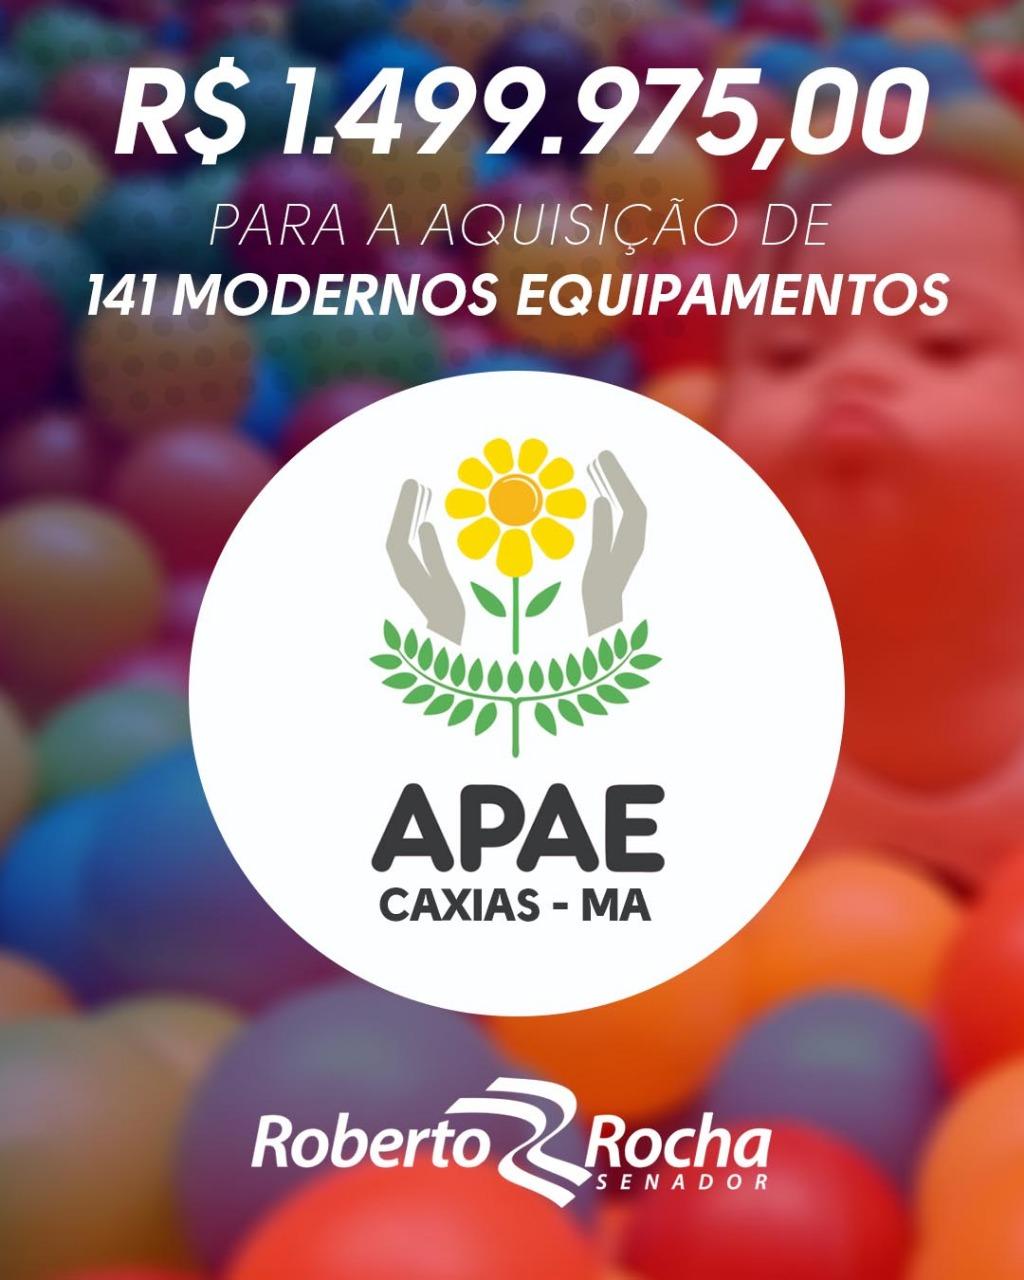 Roberto Rocha libera R$ 1,5 milhão para APAE de Caxias